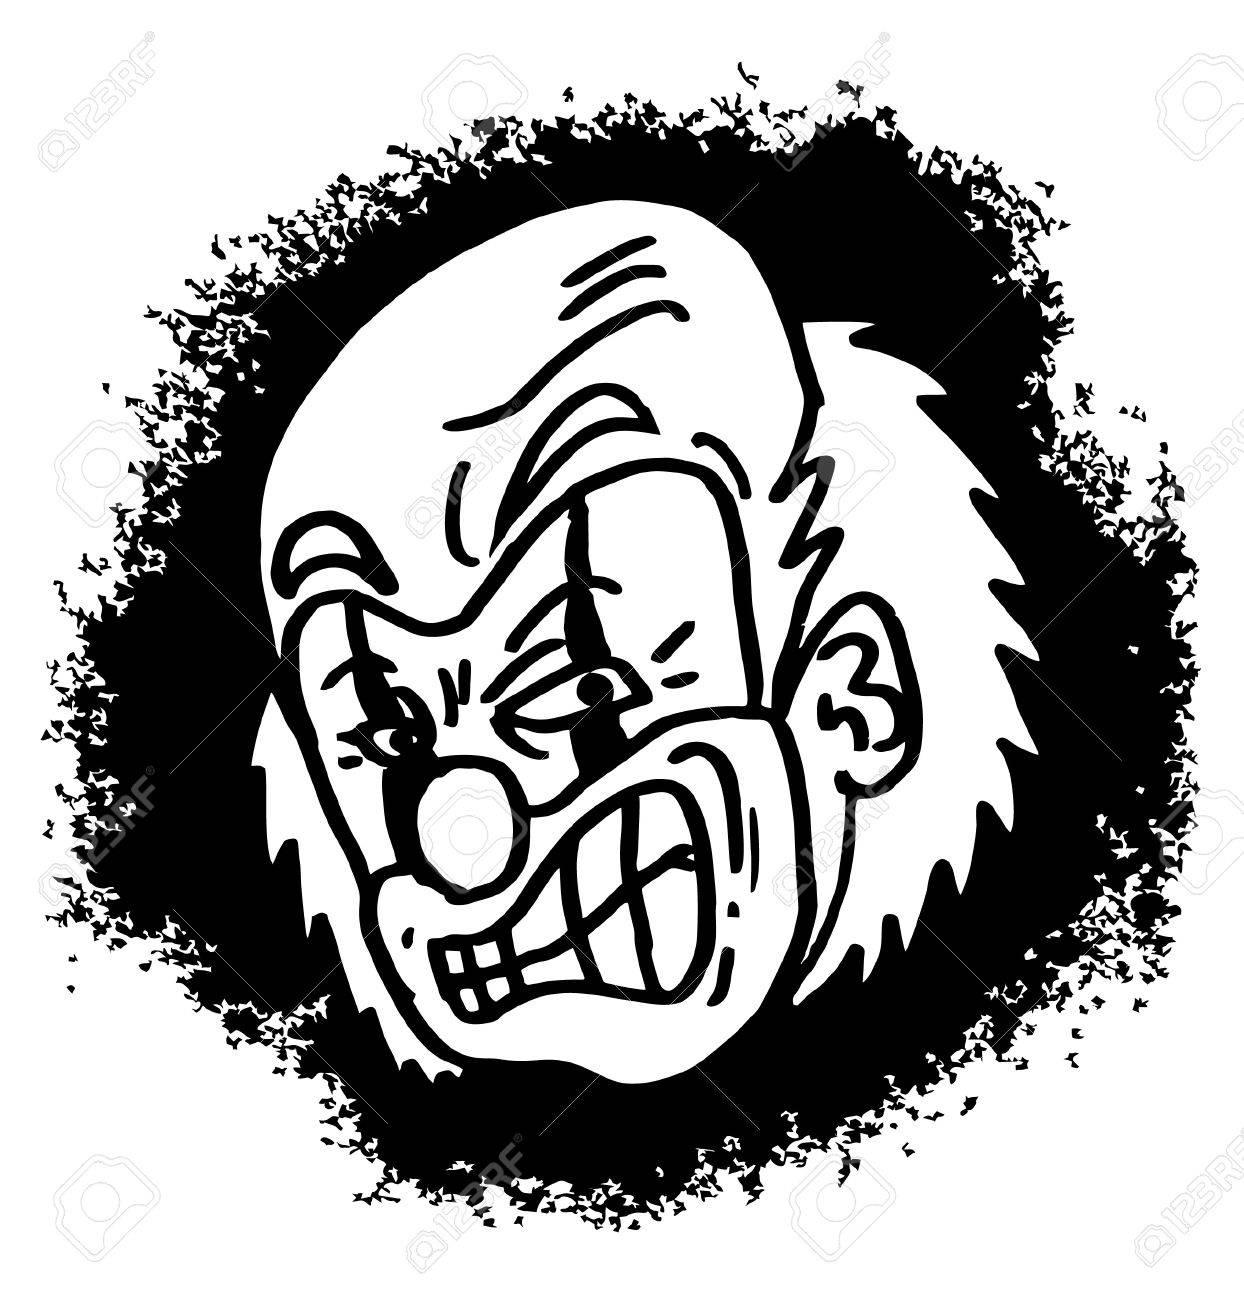 1244x1300 Draw Of Mad Clown Cartoon Royalty Free Cliparts, Vectors,